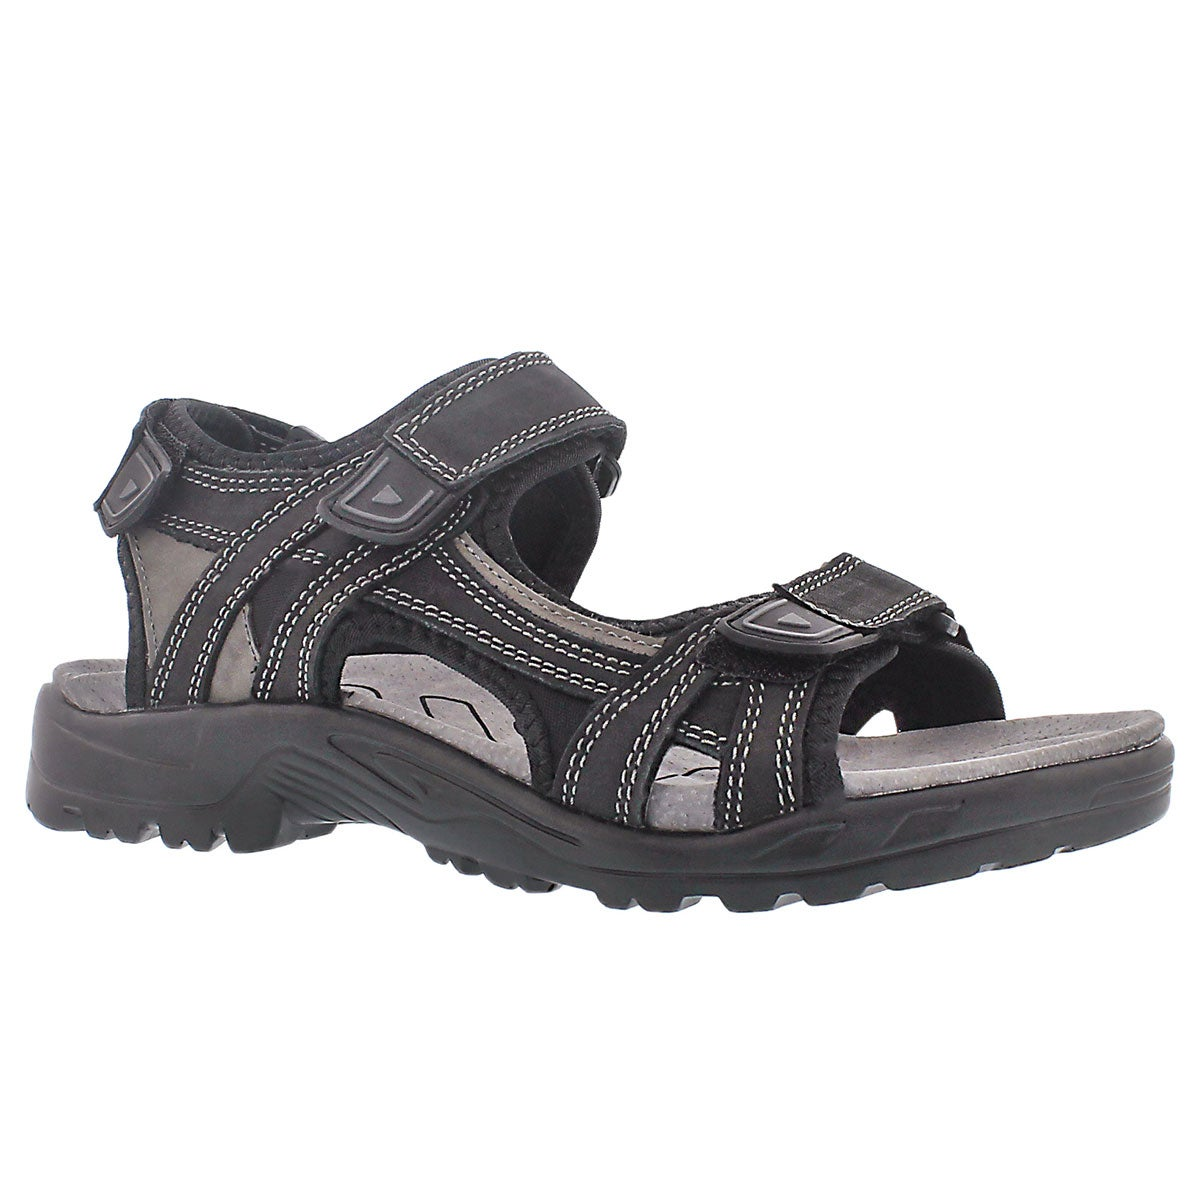 Men's KLUTCH black 3 strap sport sandals